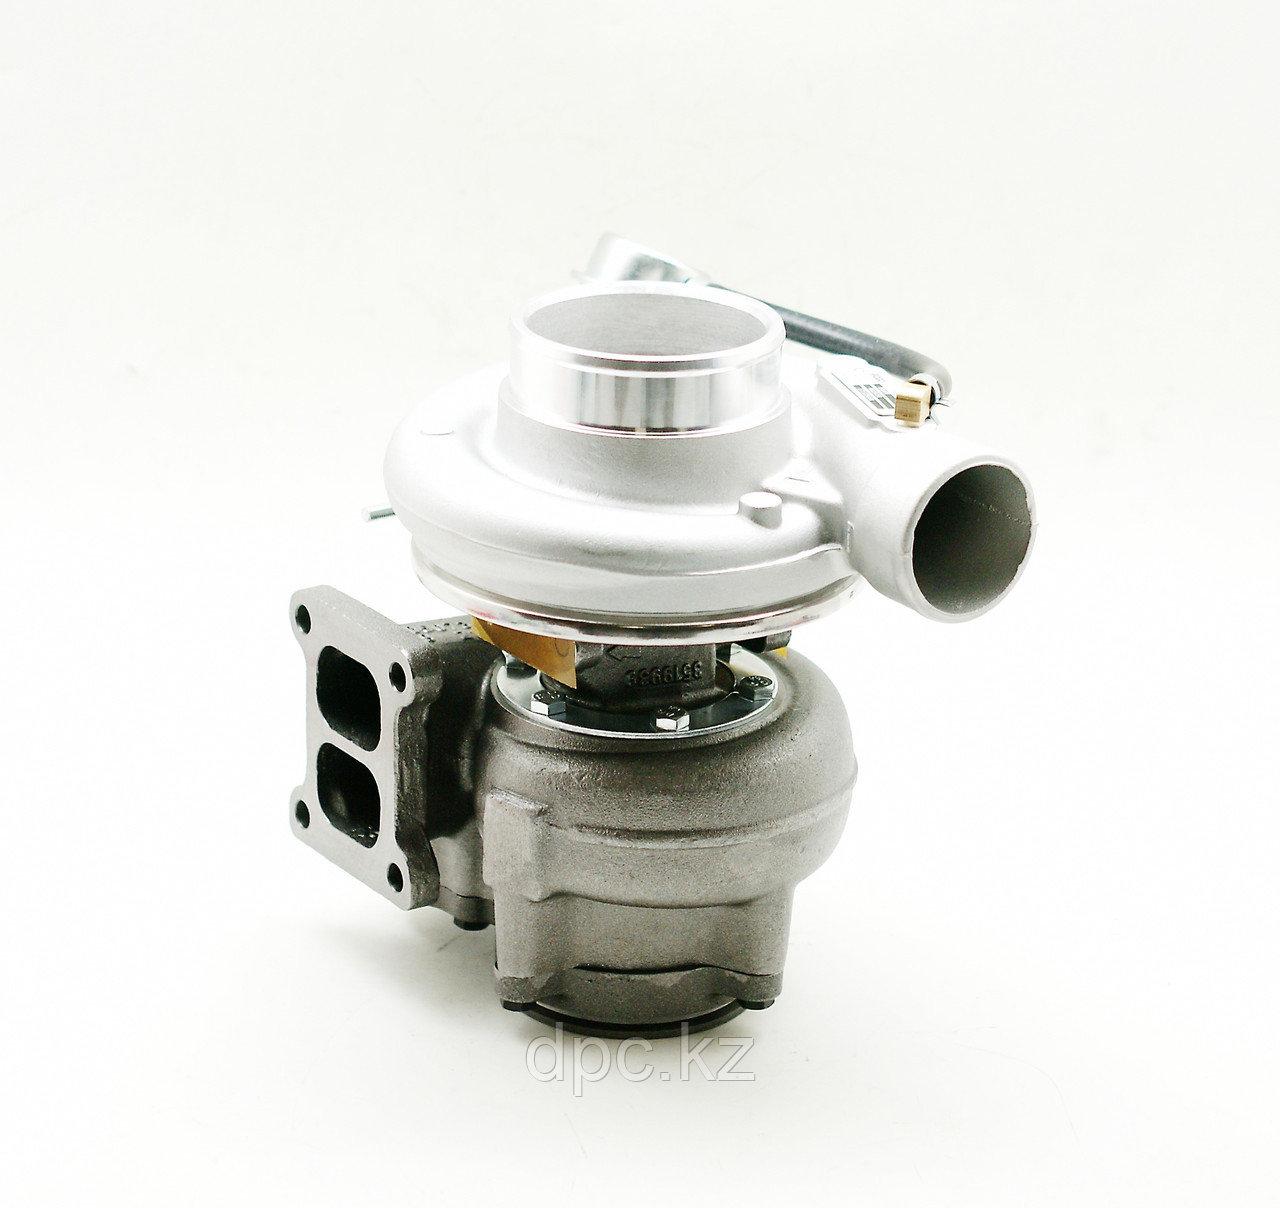 Турбокомпрессор HX40W FCEC Cummins 6CT, ISLe 4029184, 4029180